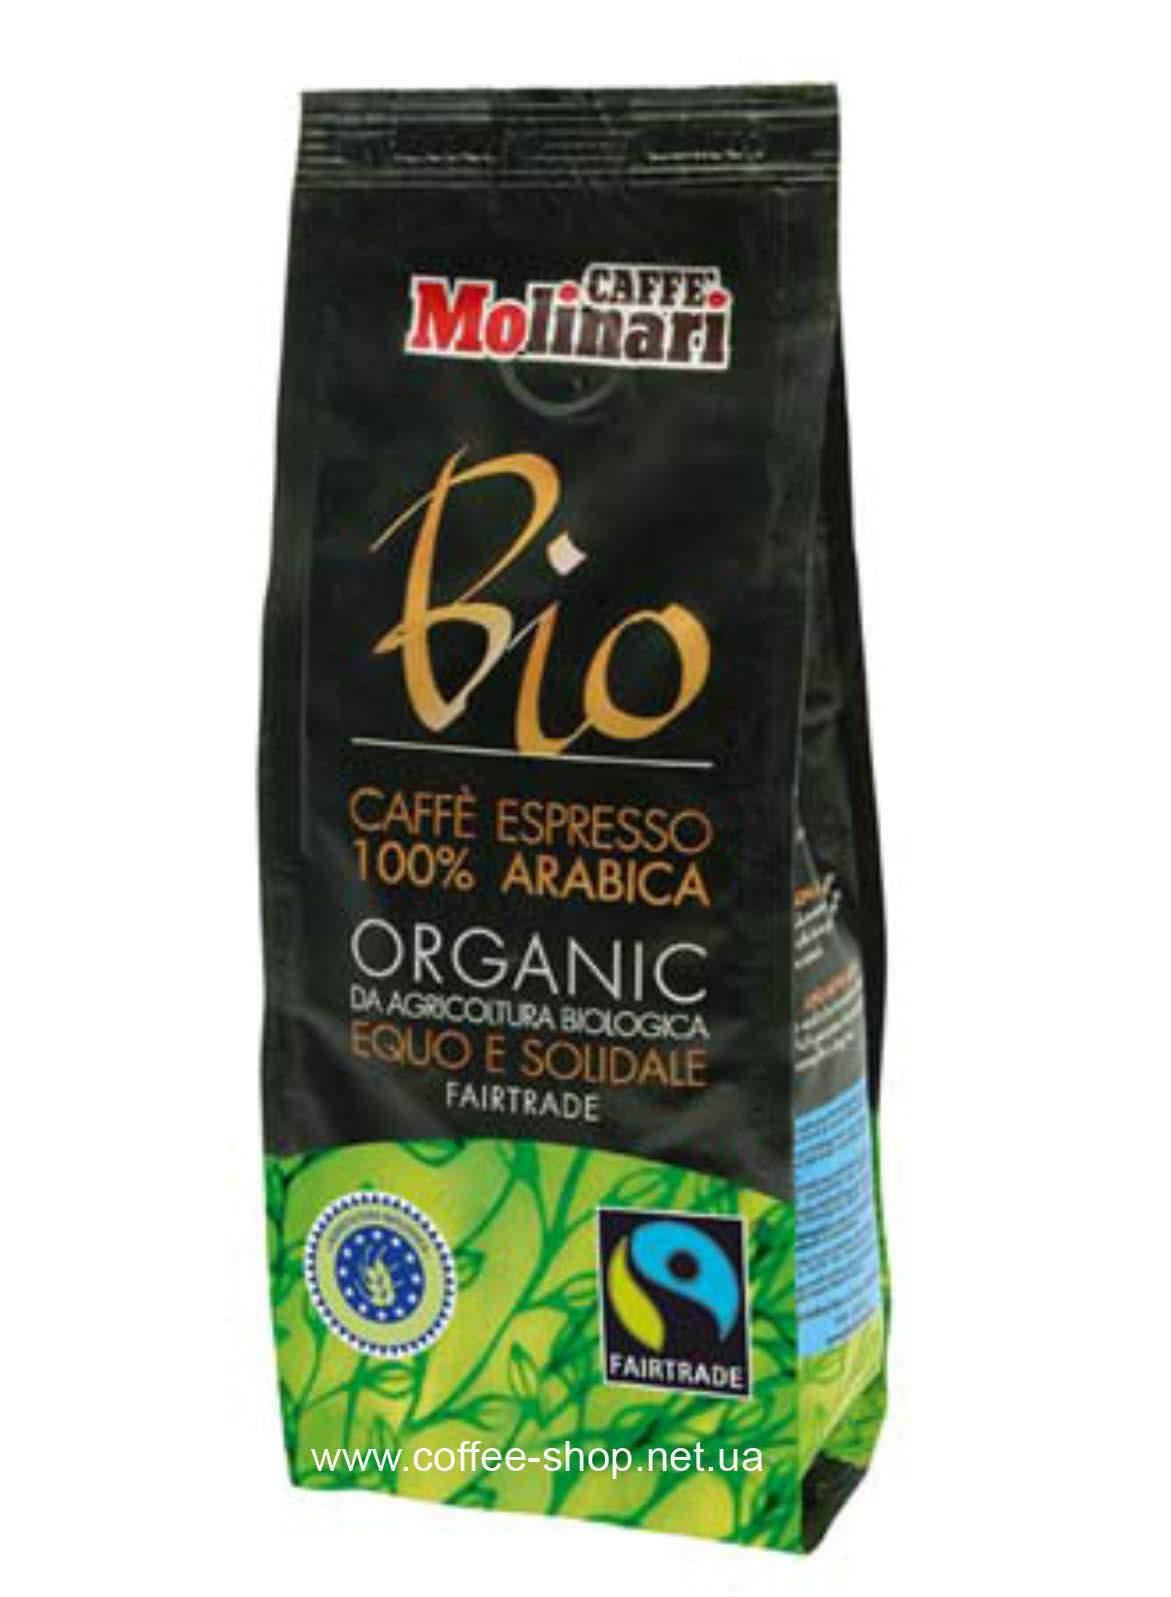 Кофе Molinari ORGANIC & FAIRTRADE молотый 250 г